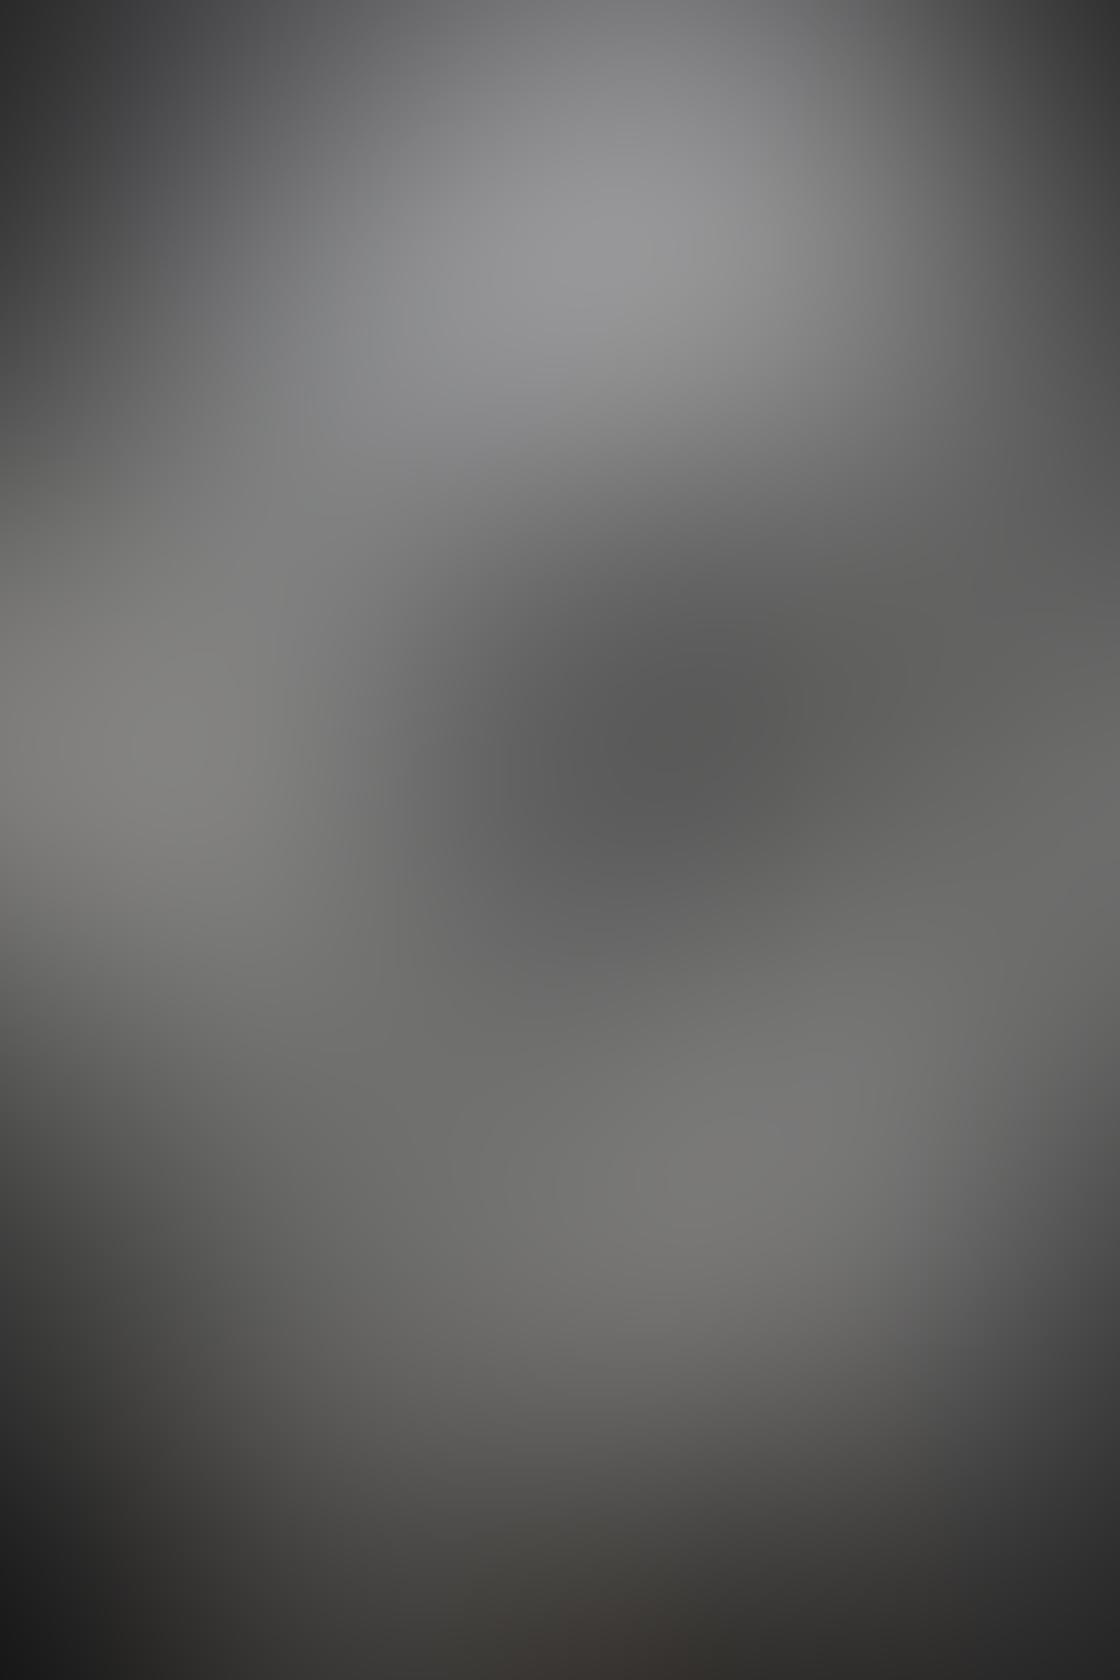 iPhone Photo Perspective 10